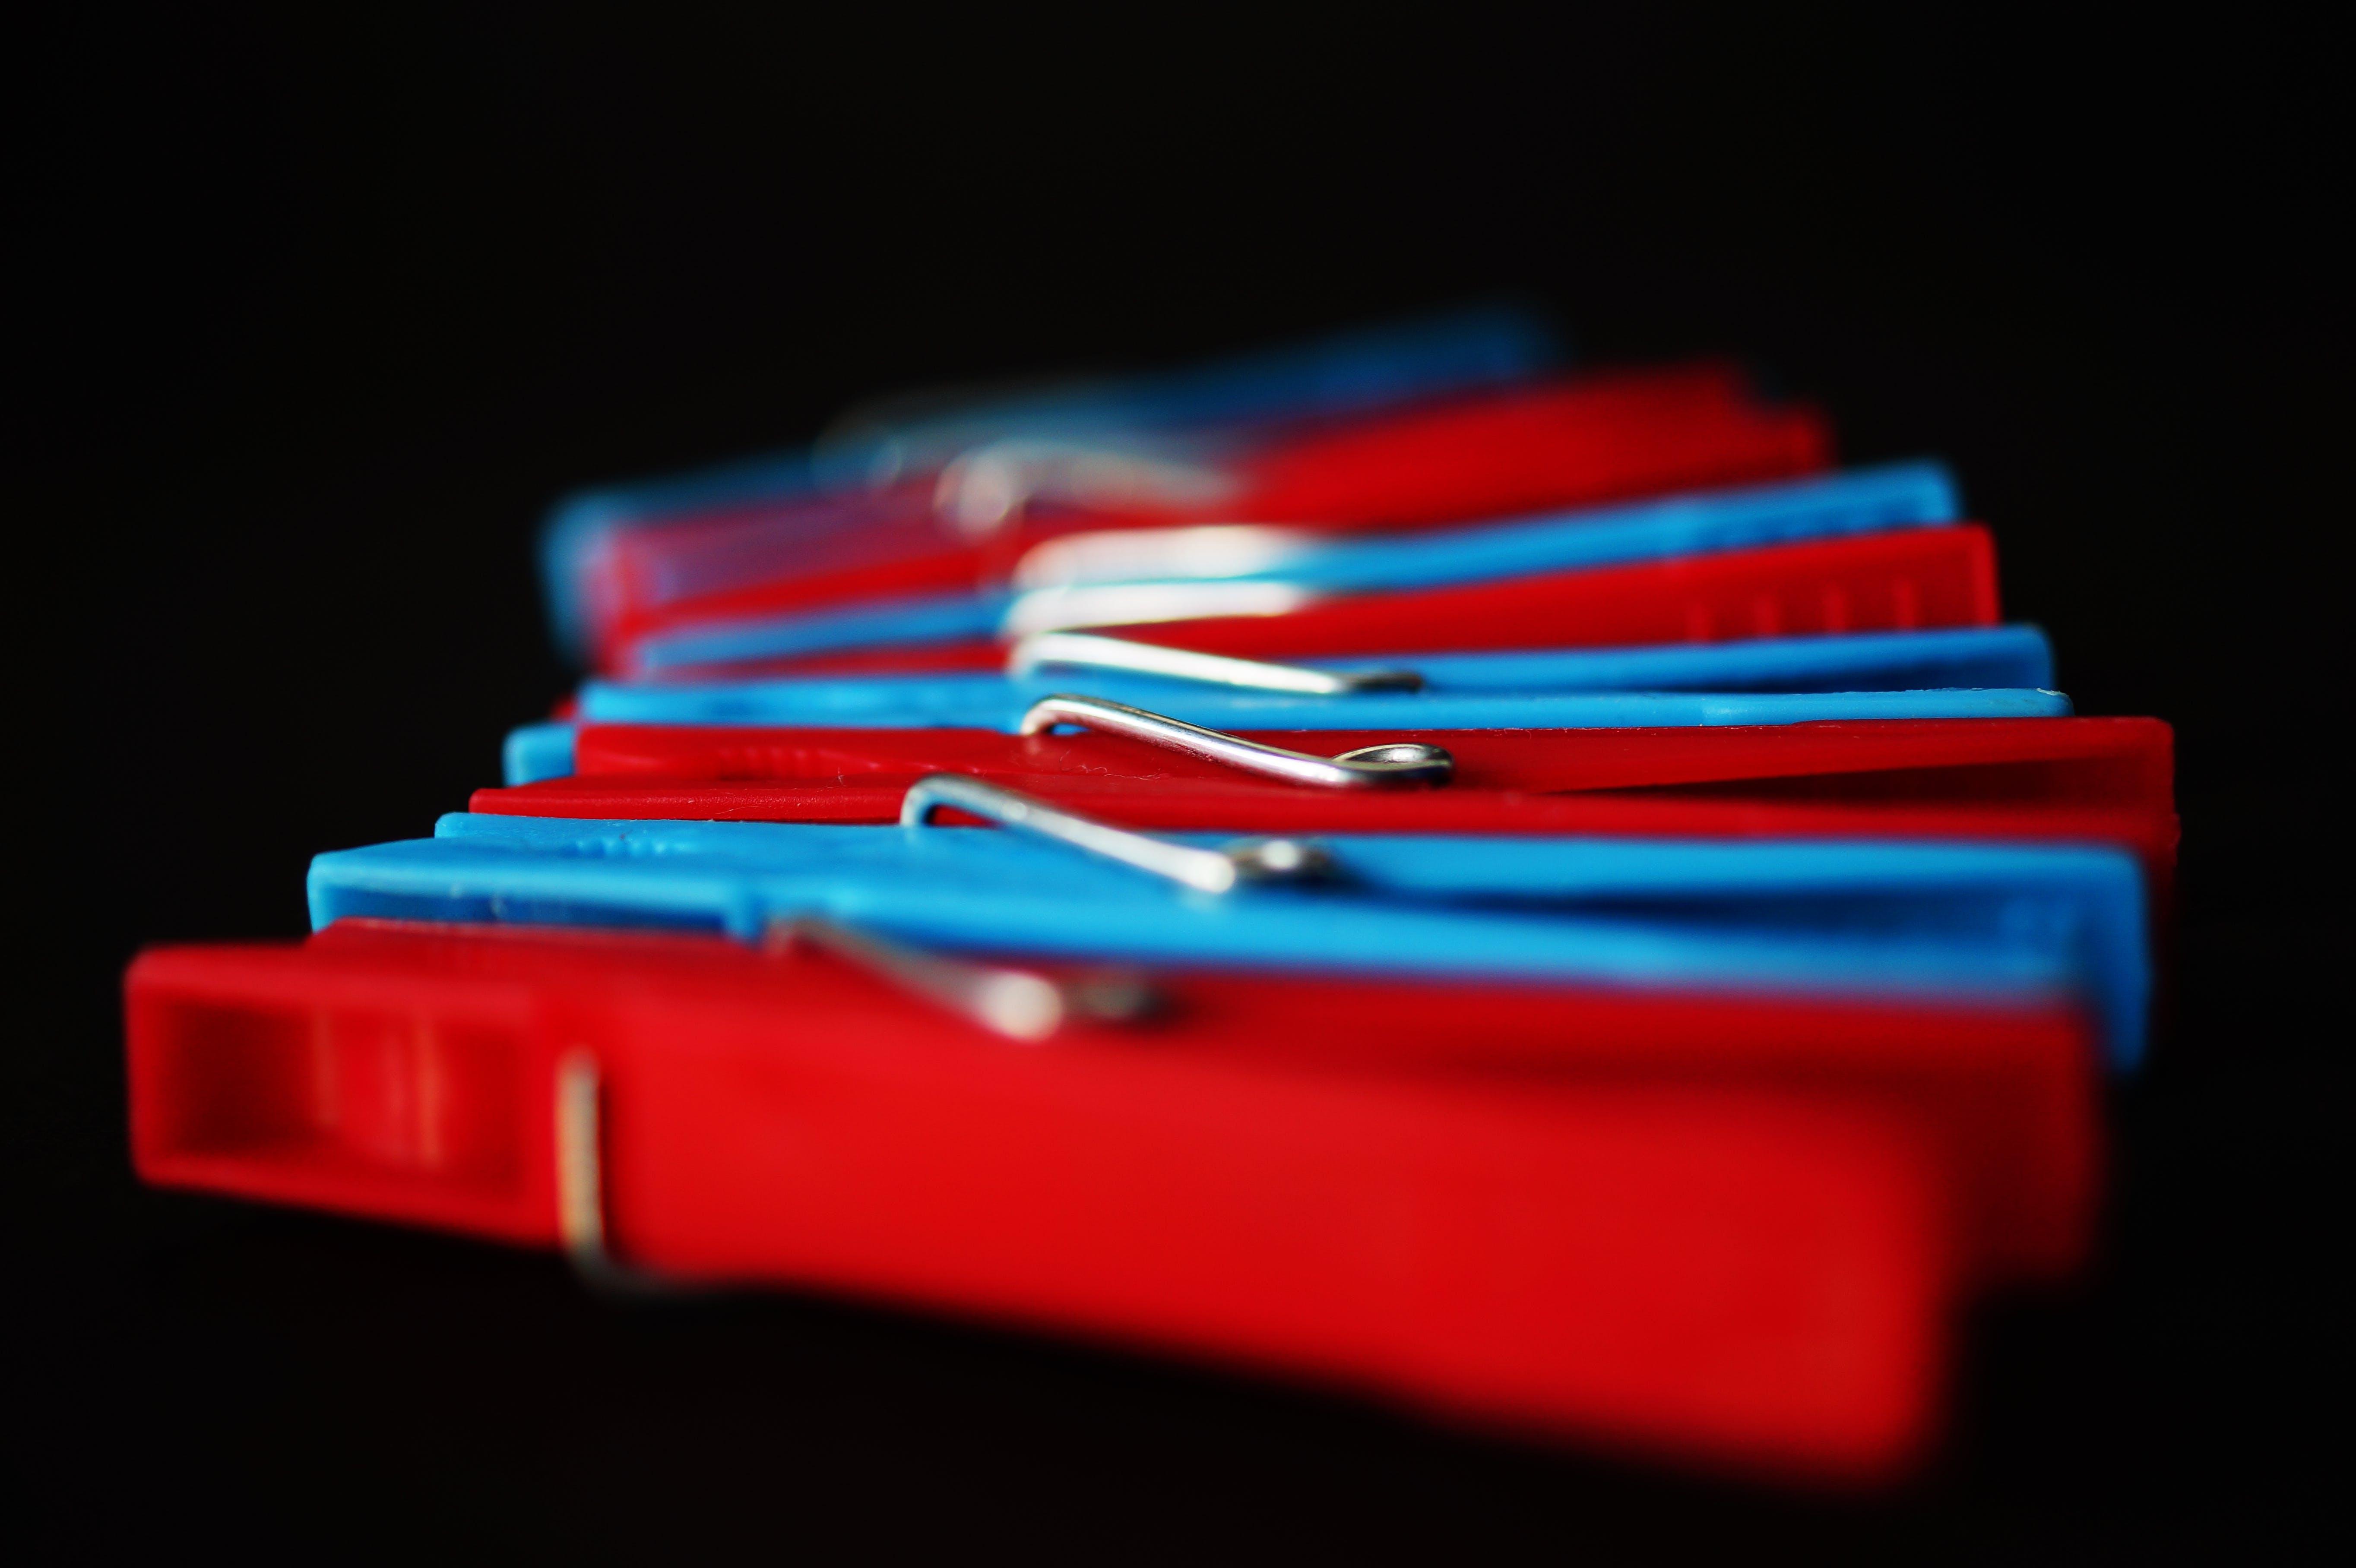 Gratis stockfoto met blauw, close-up, close-up view, kleuren